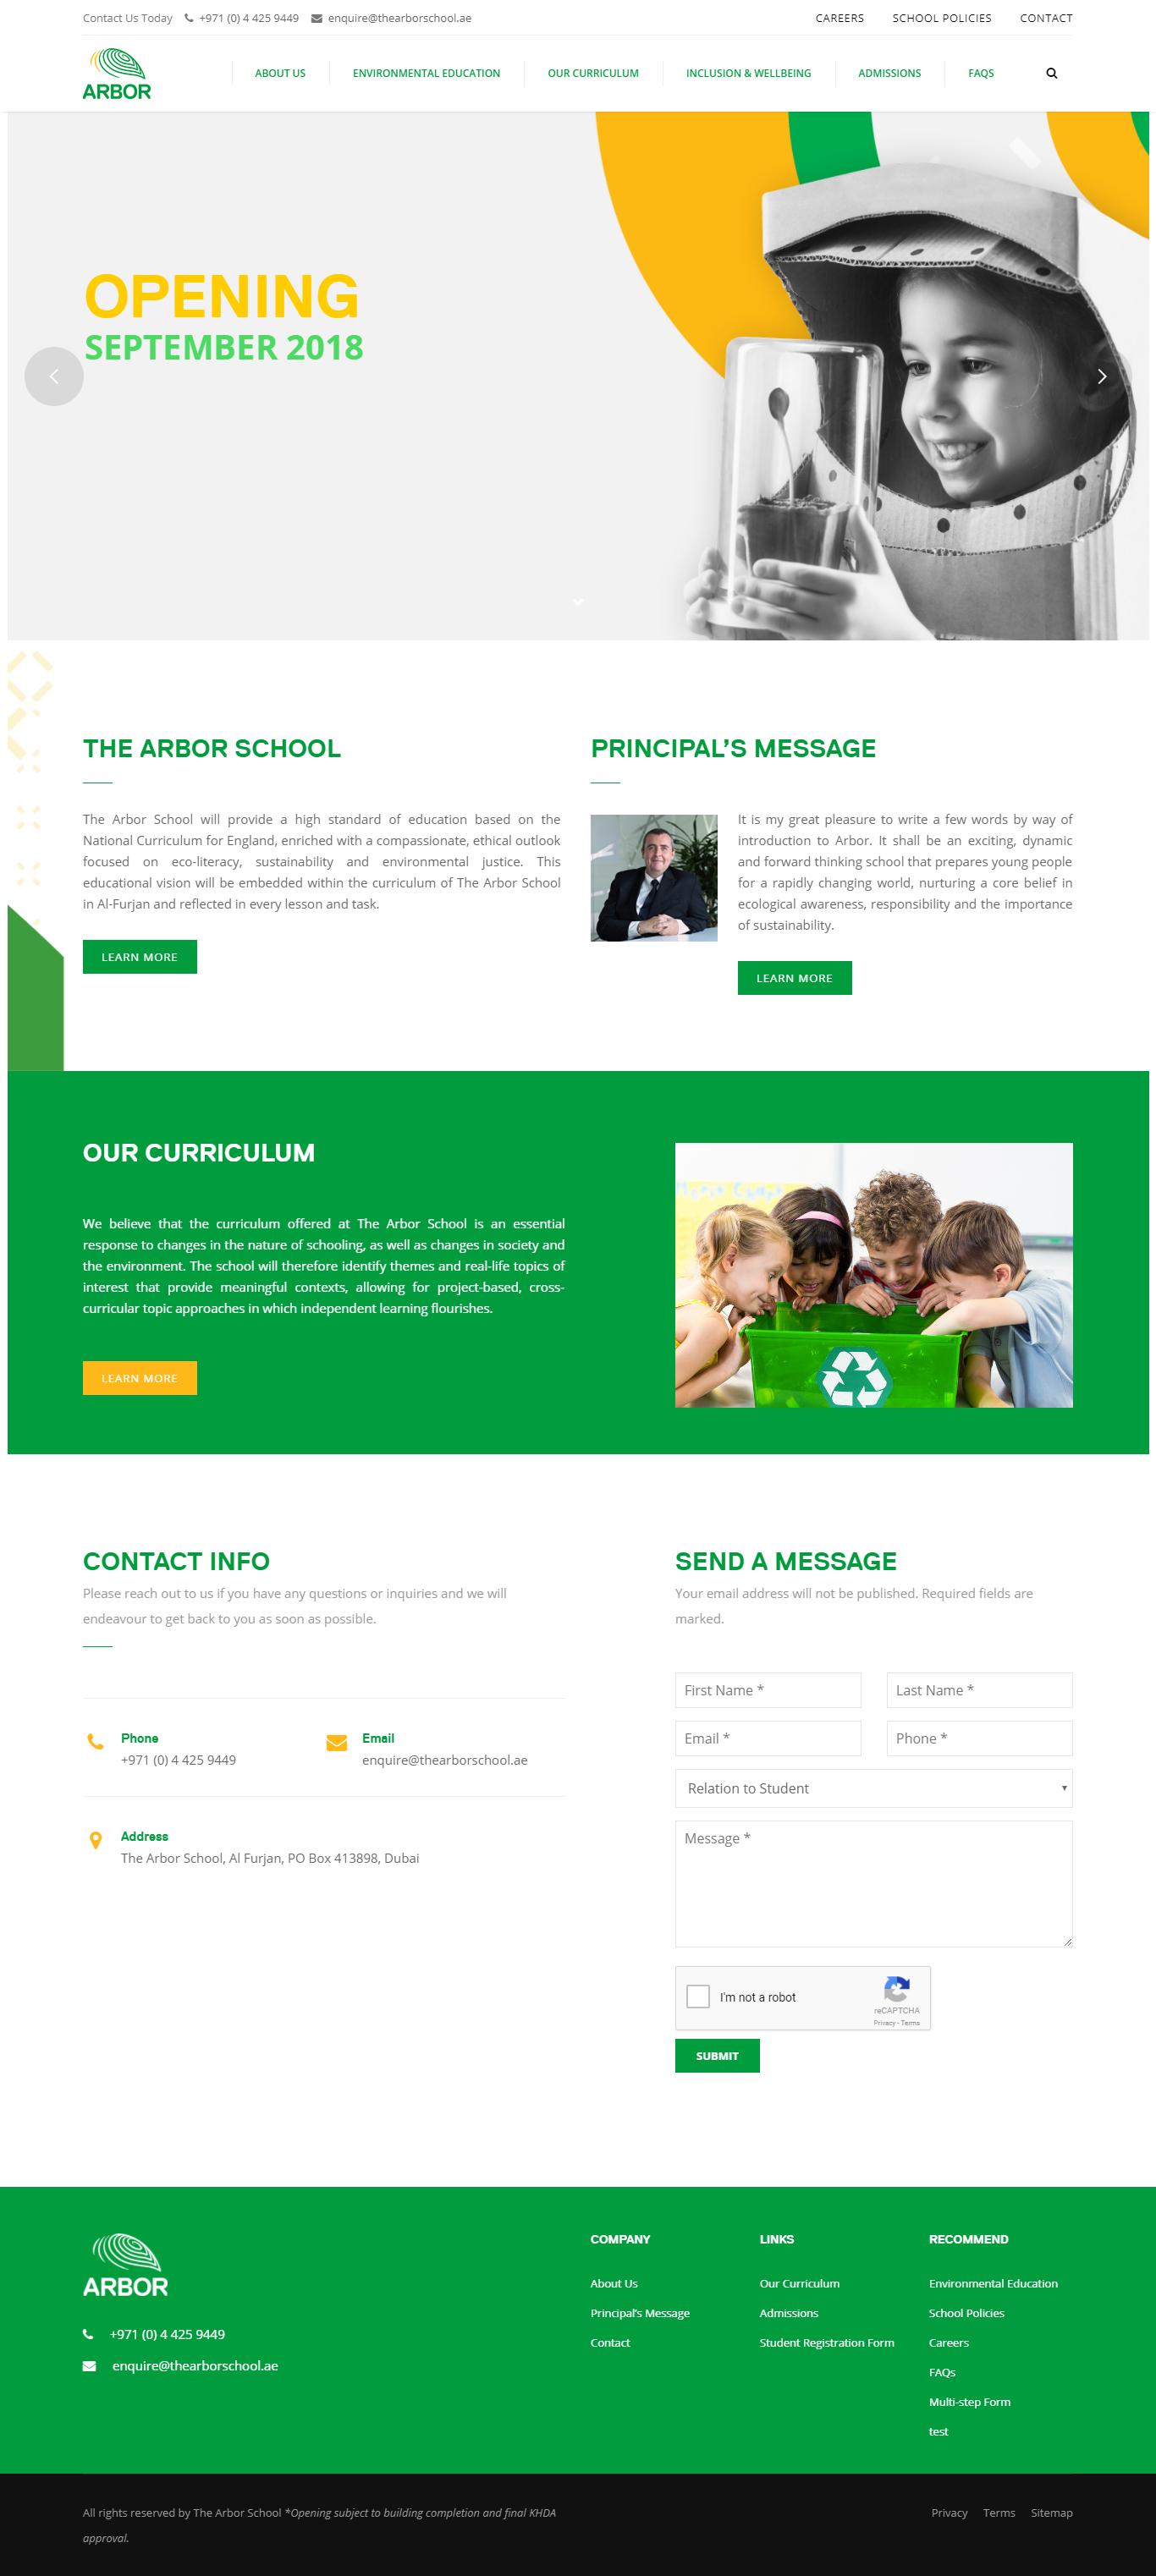 The Arbor School Website by Nexa, Dubai